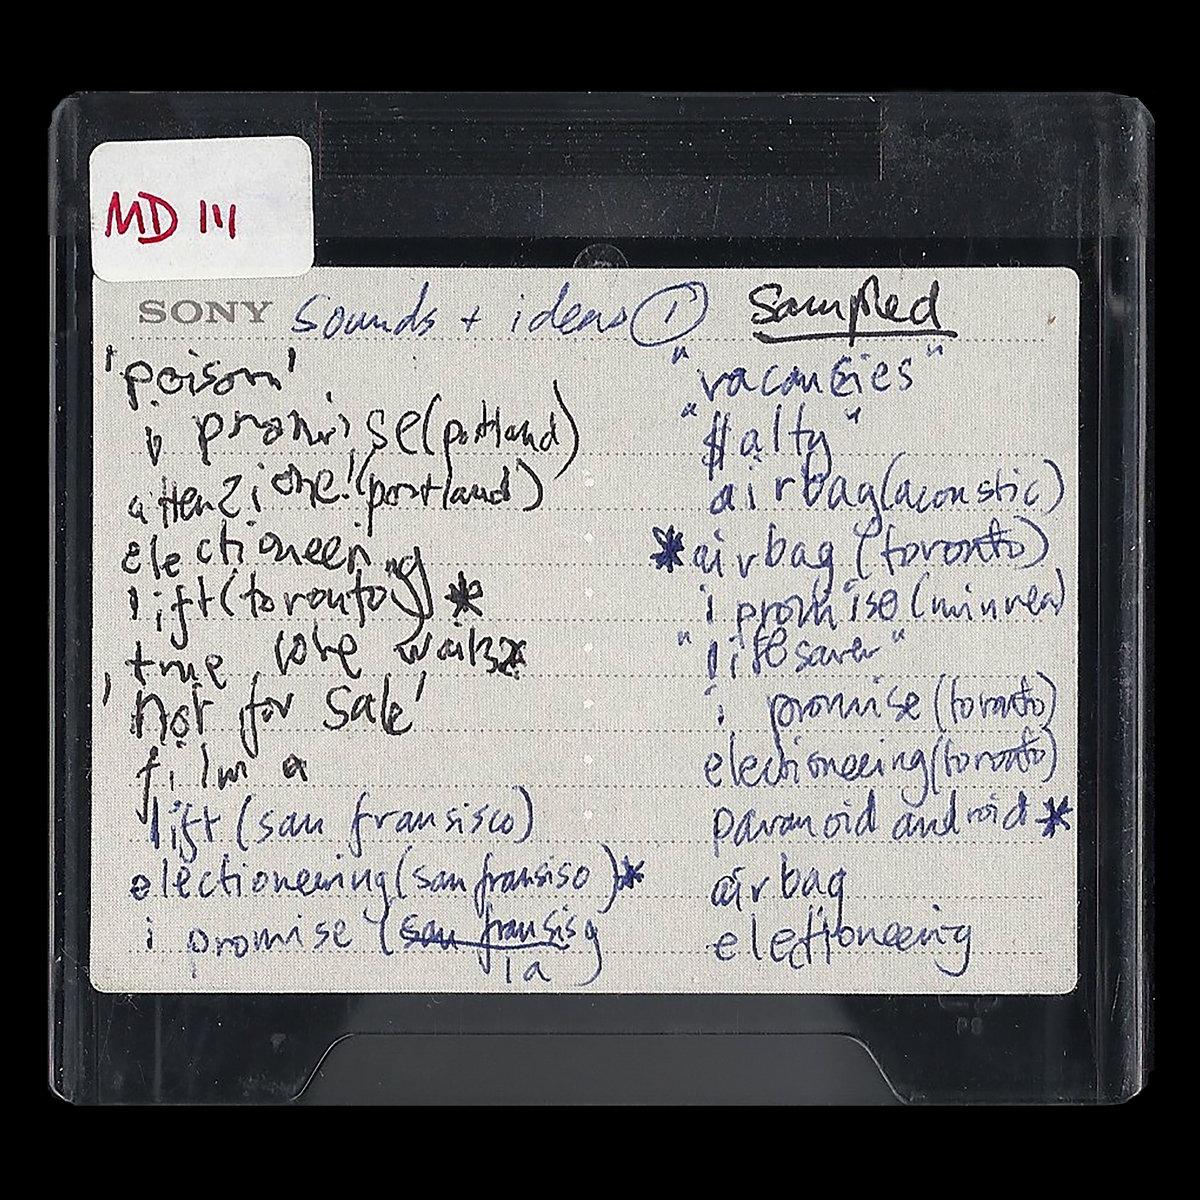 News – Radiohead – Les Sessions studio de OK Computer en partage